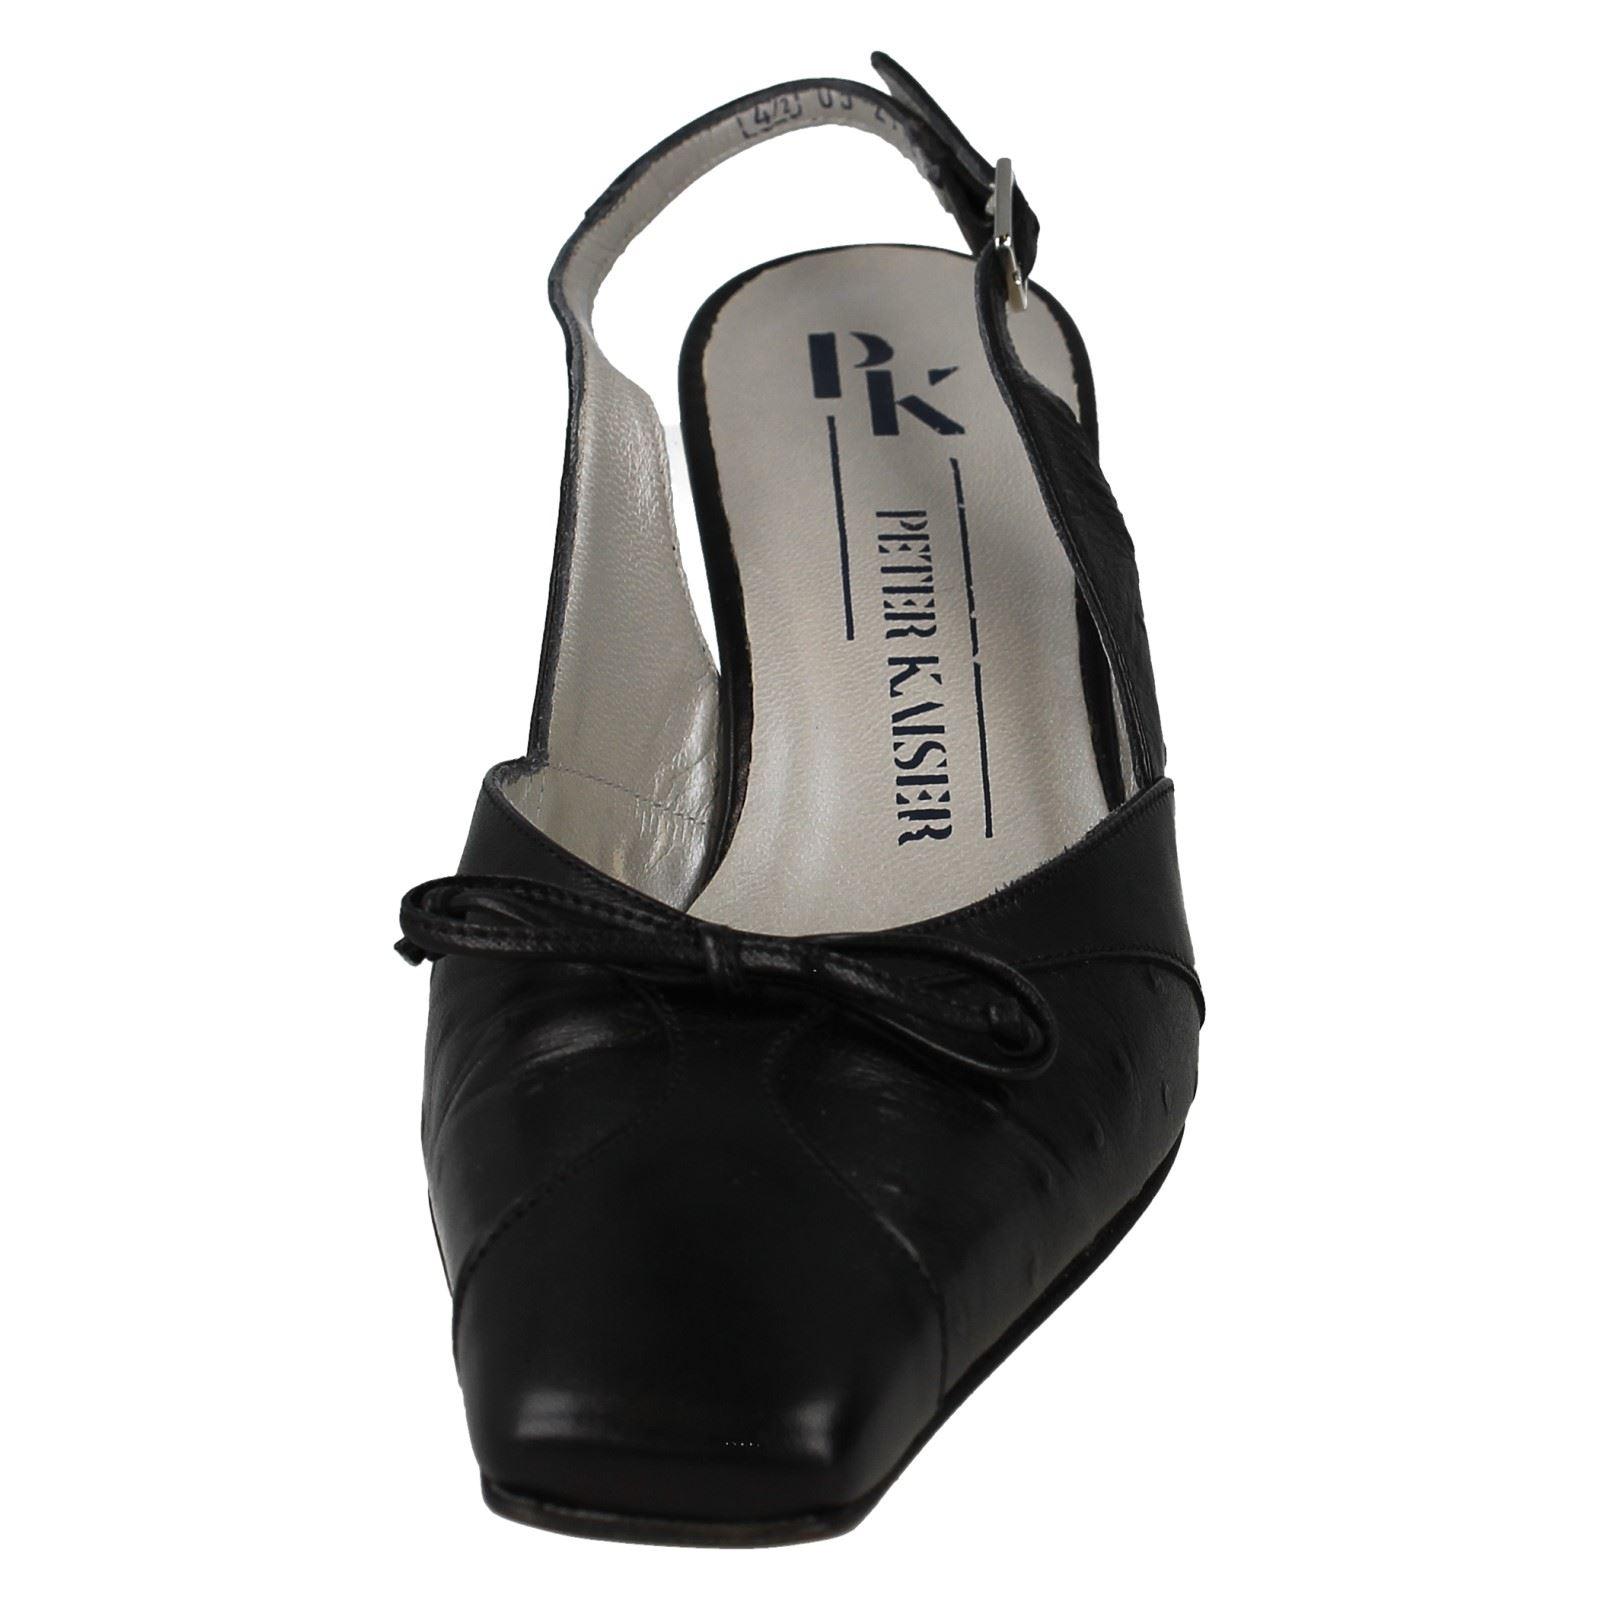 Kaiser Peter The Ladies Black Court Chevro Style Slingback Shoes Buckle Borgia 15Zn4Zq